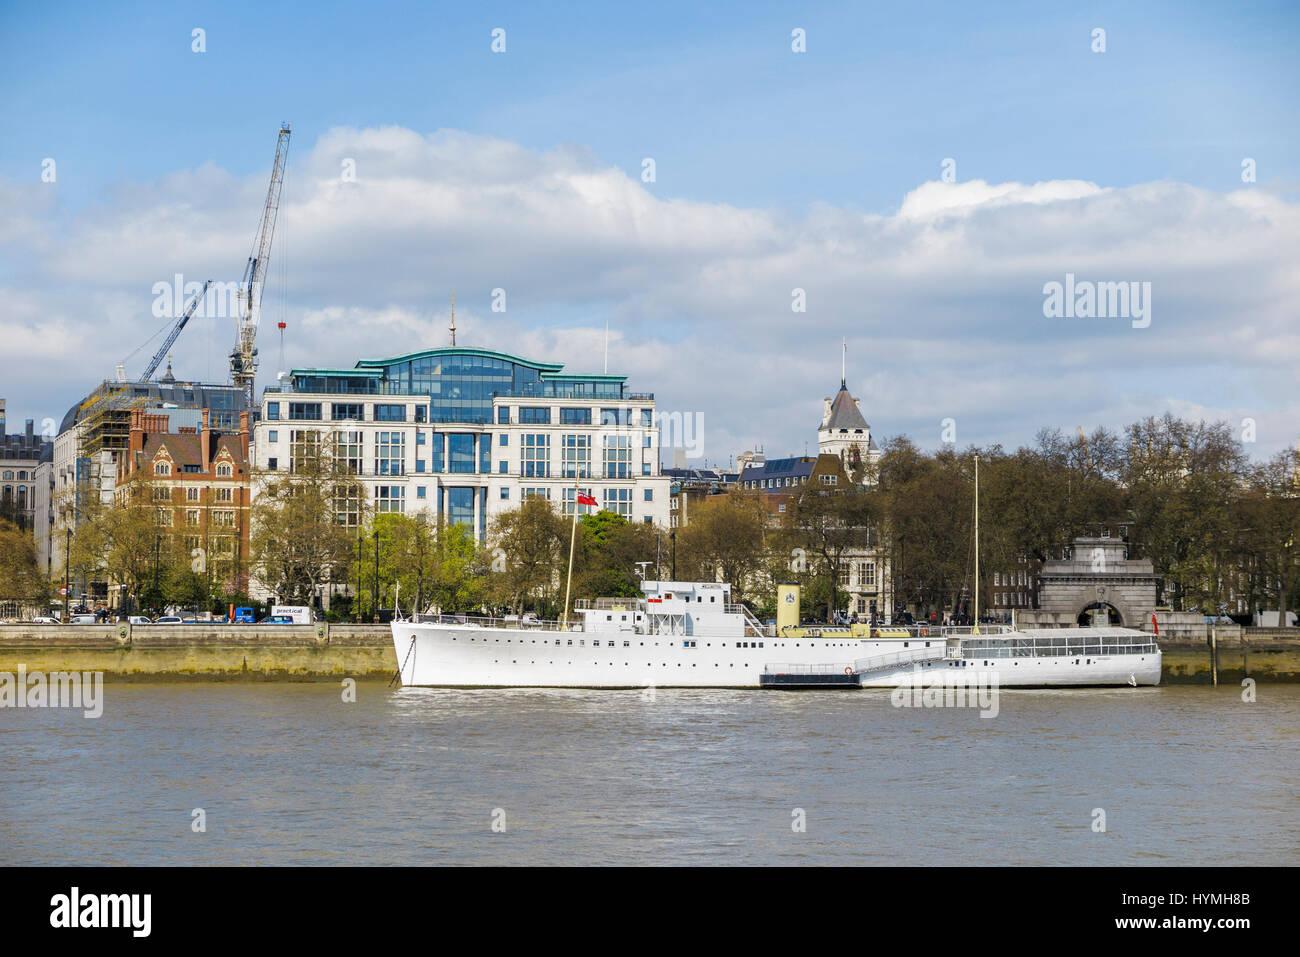 HQS Wellington, el hogar de la Honorable Sociedad de Master Mariners, Templo escaleras, Victoria Embankment, London Imagen De Stock